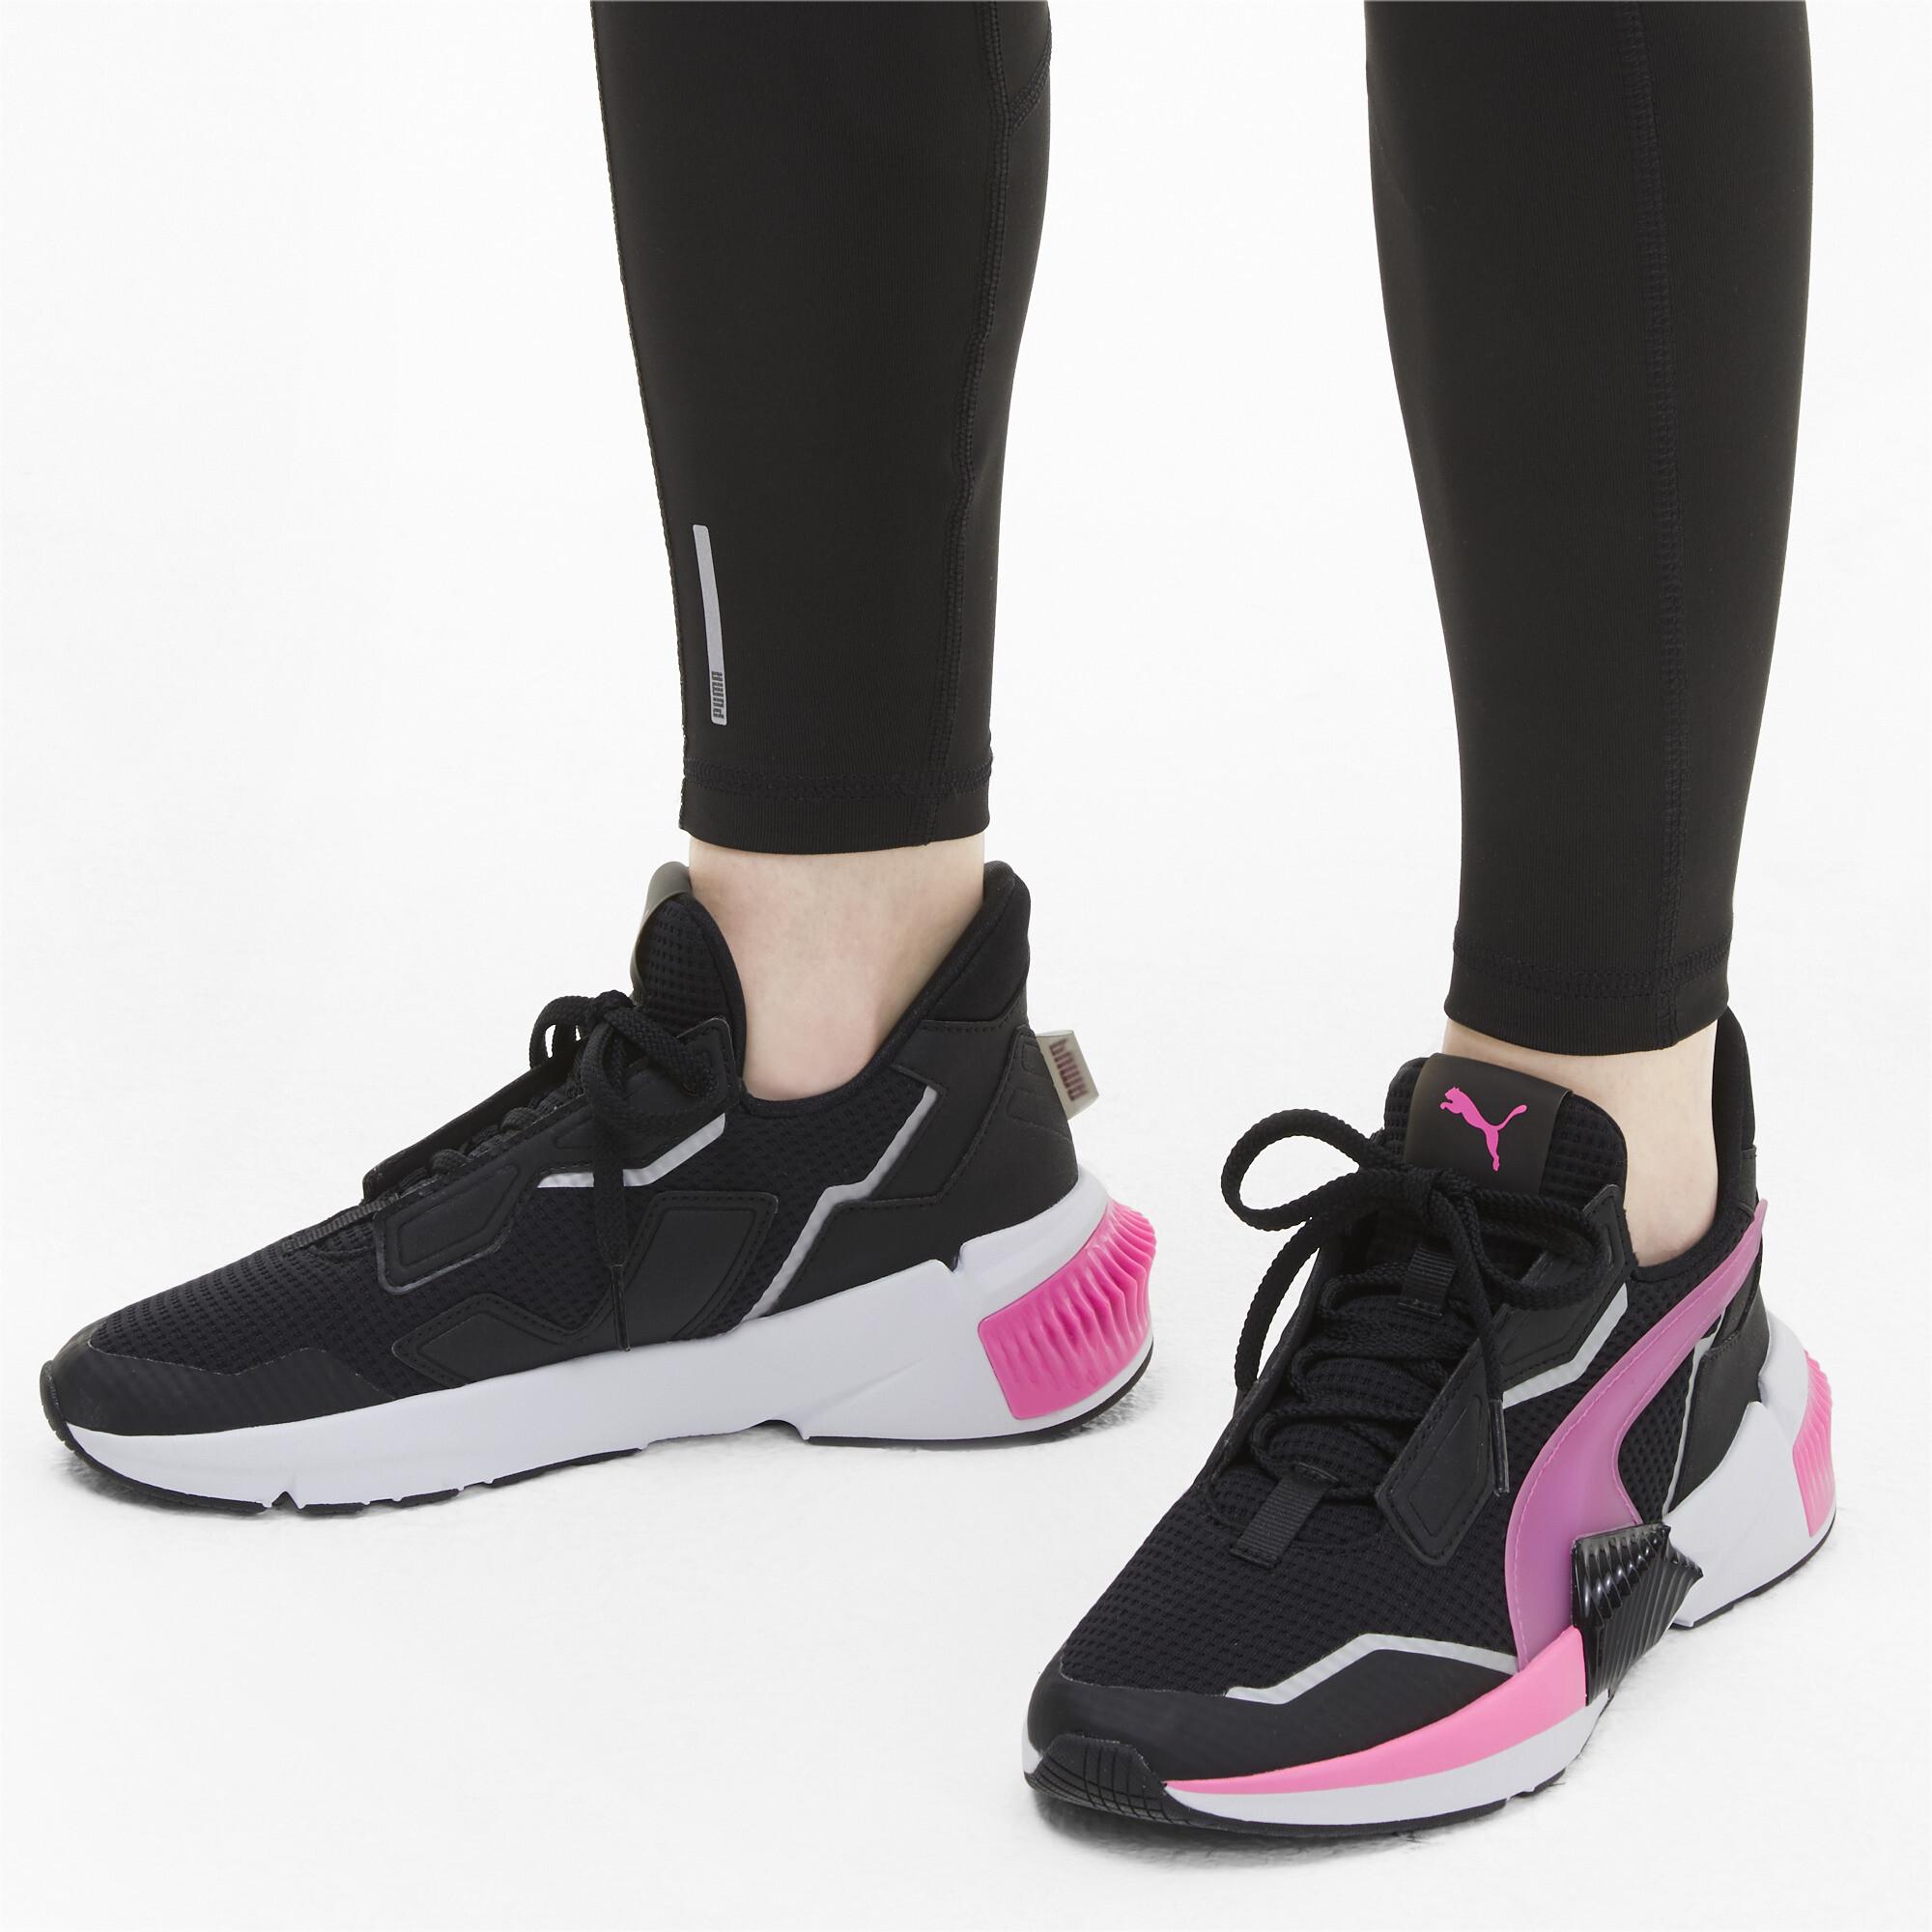 Indexbild 15 - PUMA Provoke XT Damen Trainingsschuhe Frauen Stiefelette Training Neu